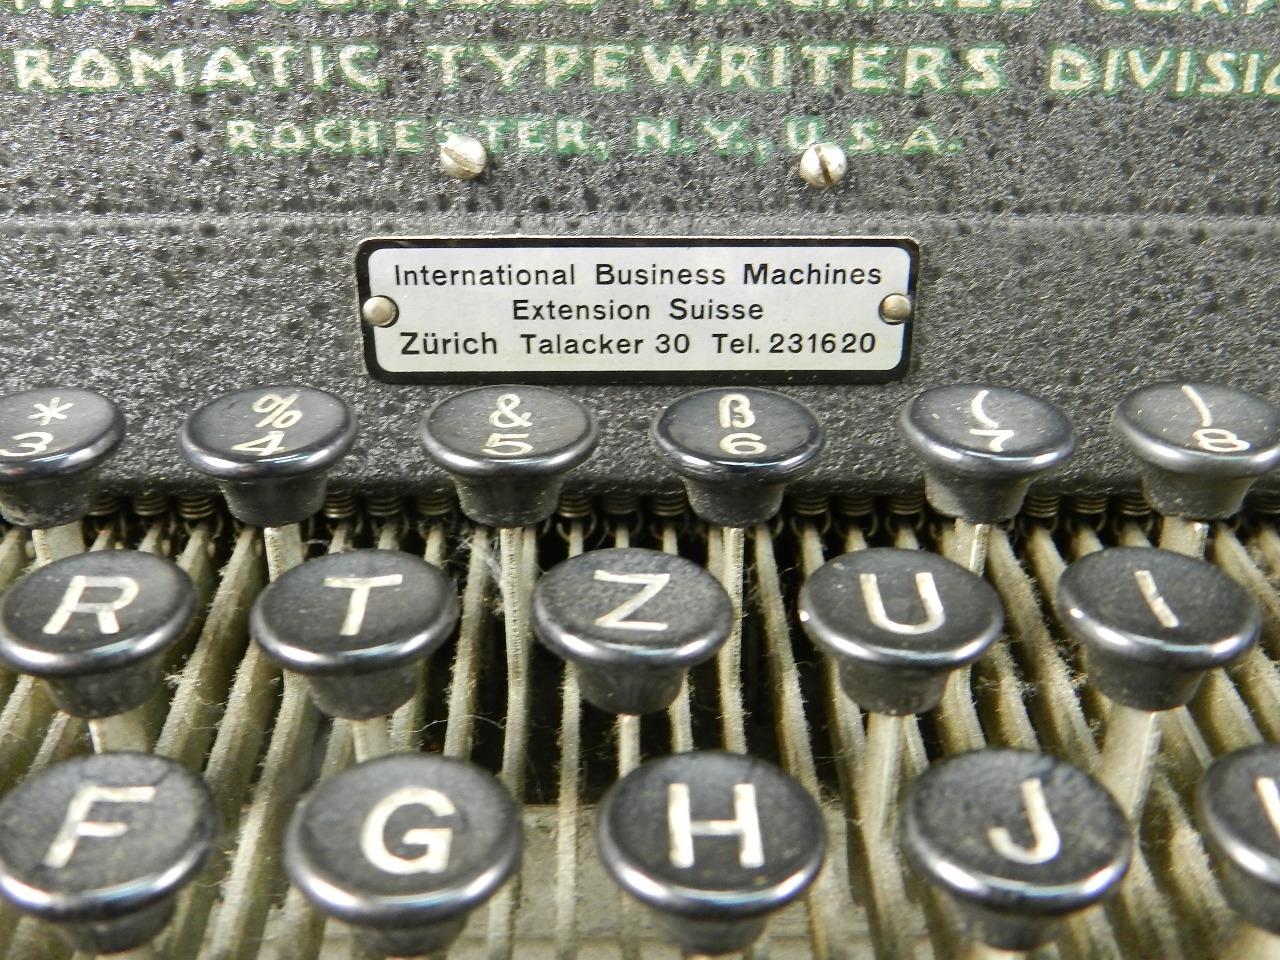 Imagen IBM ELECTROMATIC AÑO 1935 40292